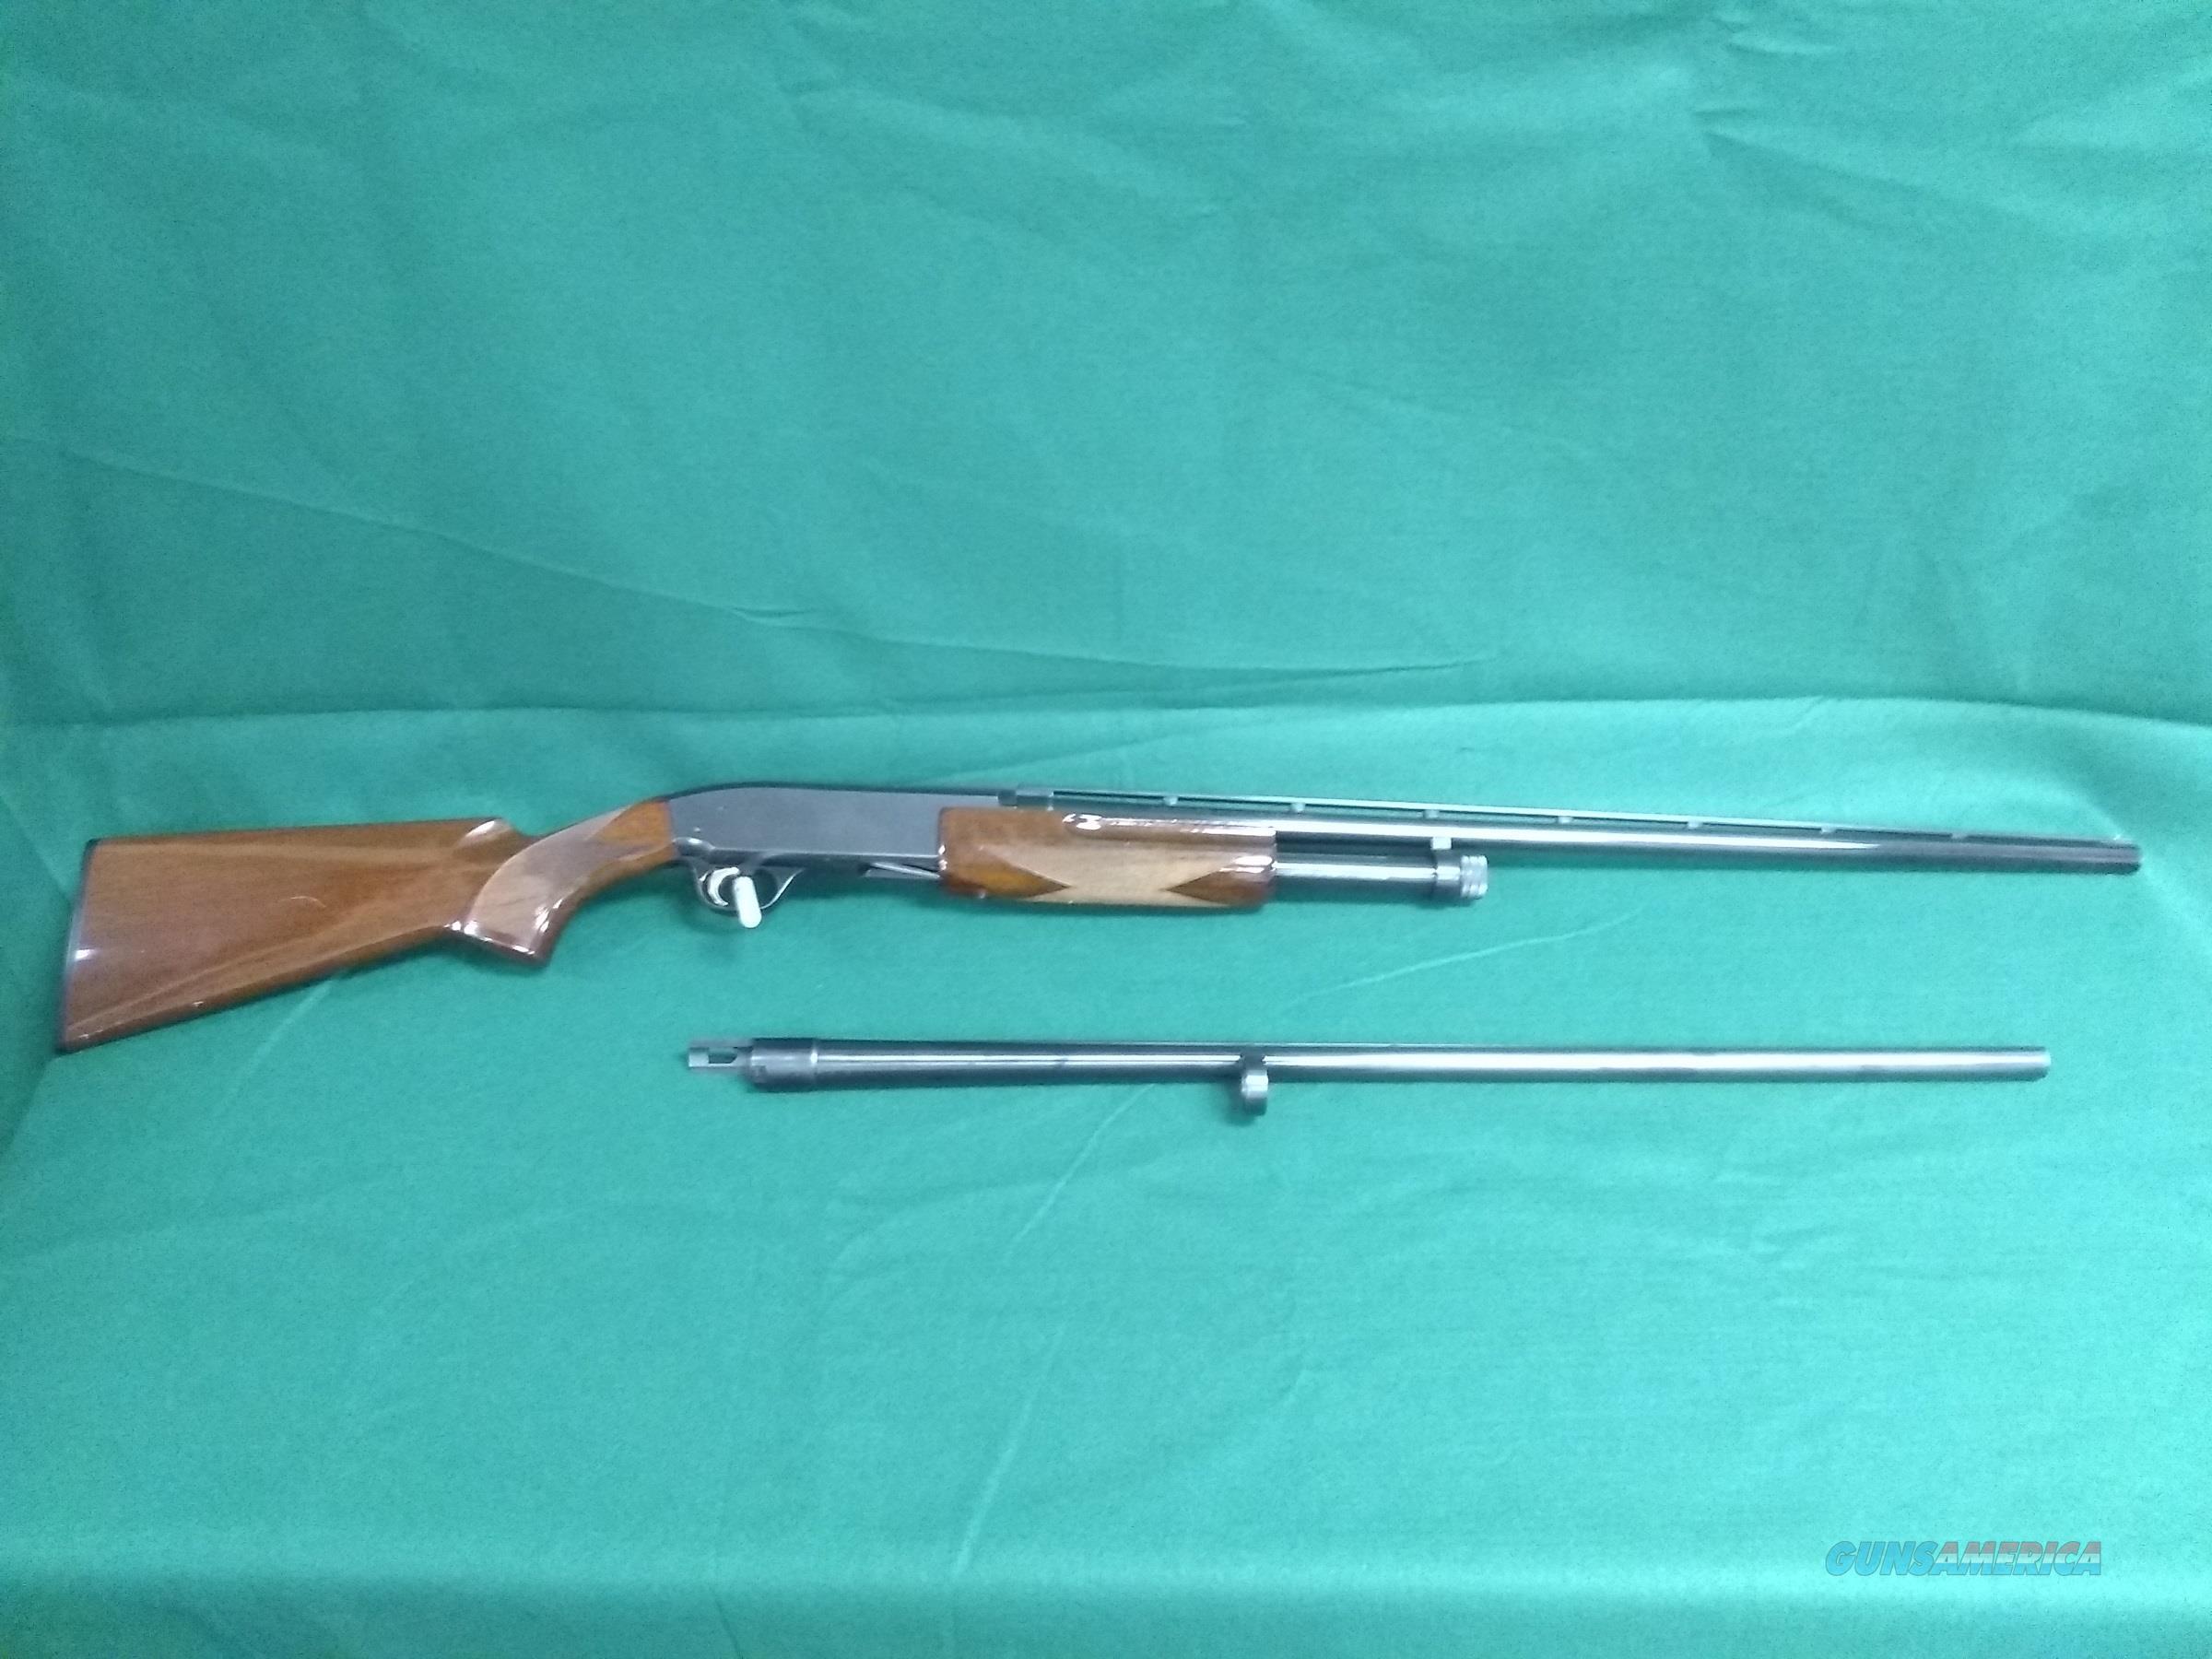 Browning BPS 20GA - Two Barrel Set  Guns > Shotguns > Browning Shotguns > Pump Action > Hunting